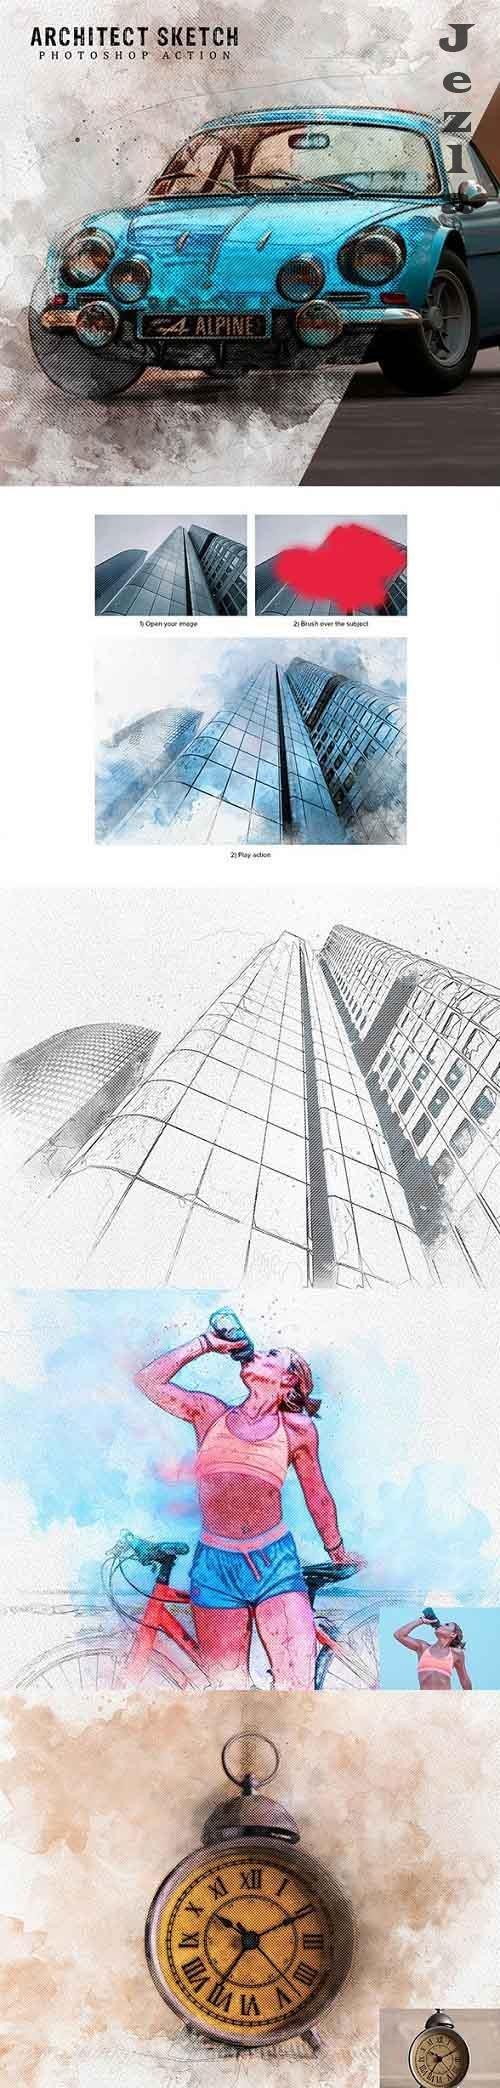 GraphicRiver - Architect Sketch Photoshop Action 28522875